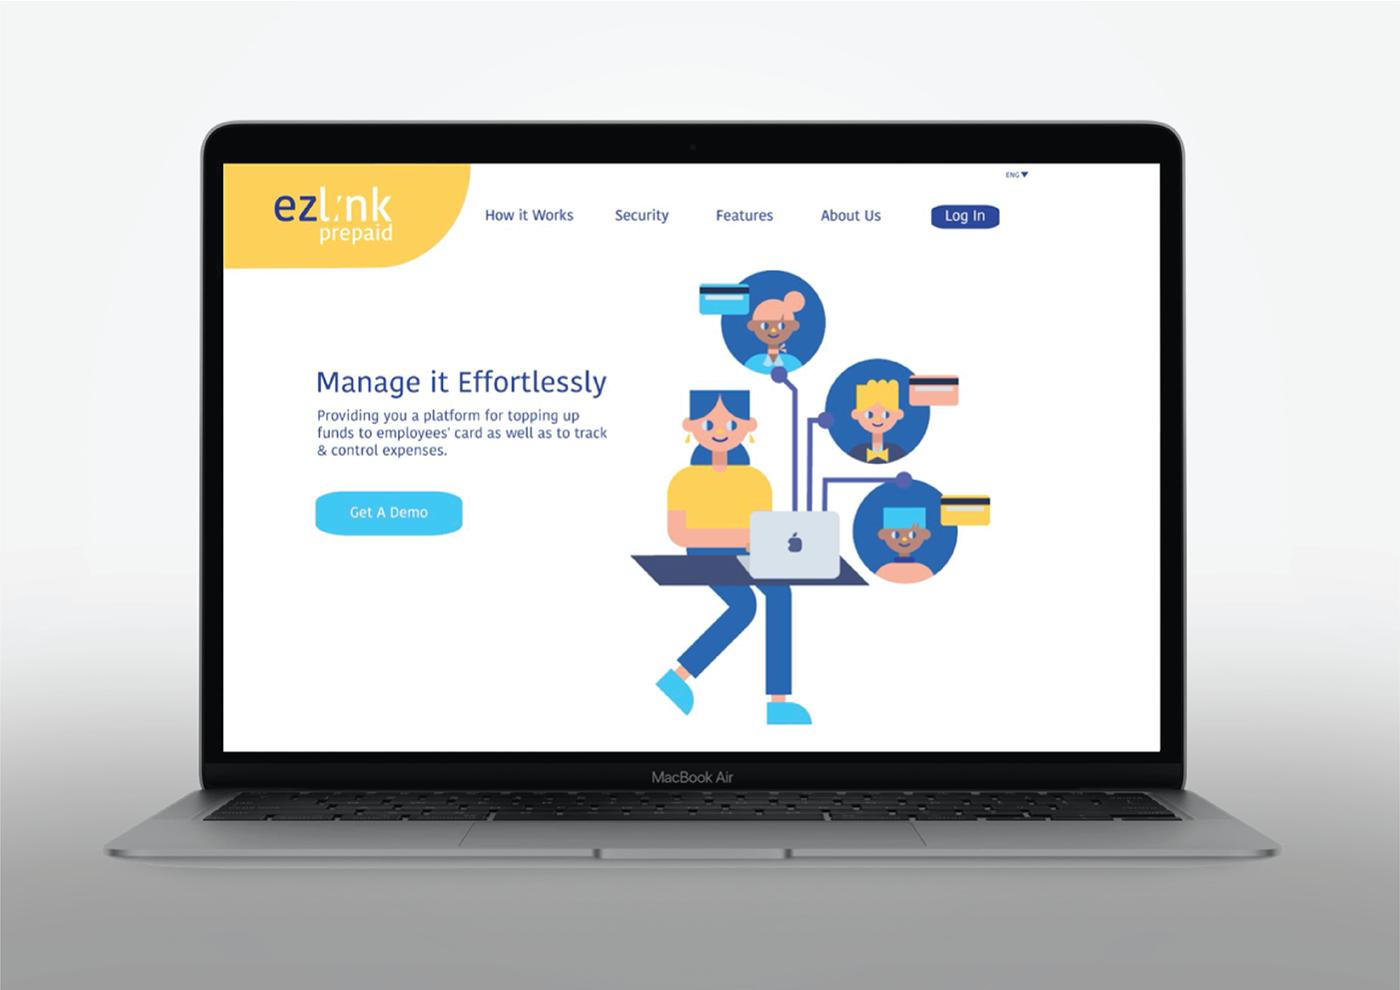 advertisement animation  branding  business collaterals credit card Debit card EZ Link  Prepaid rebranding